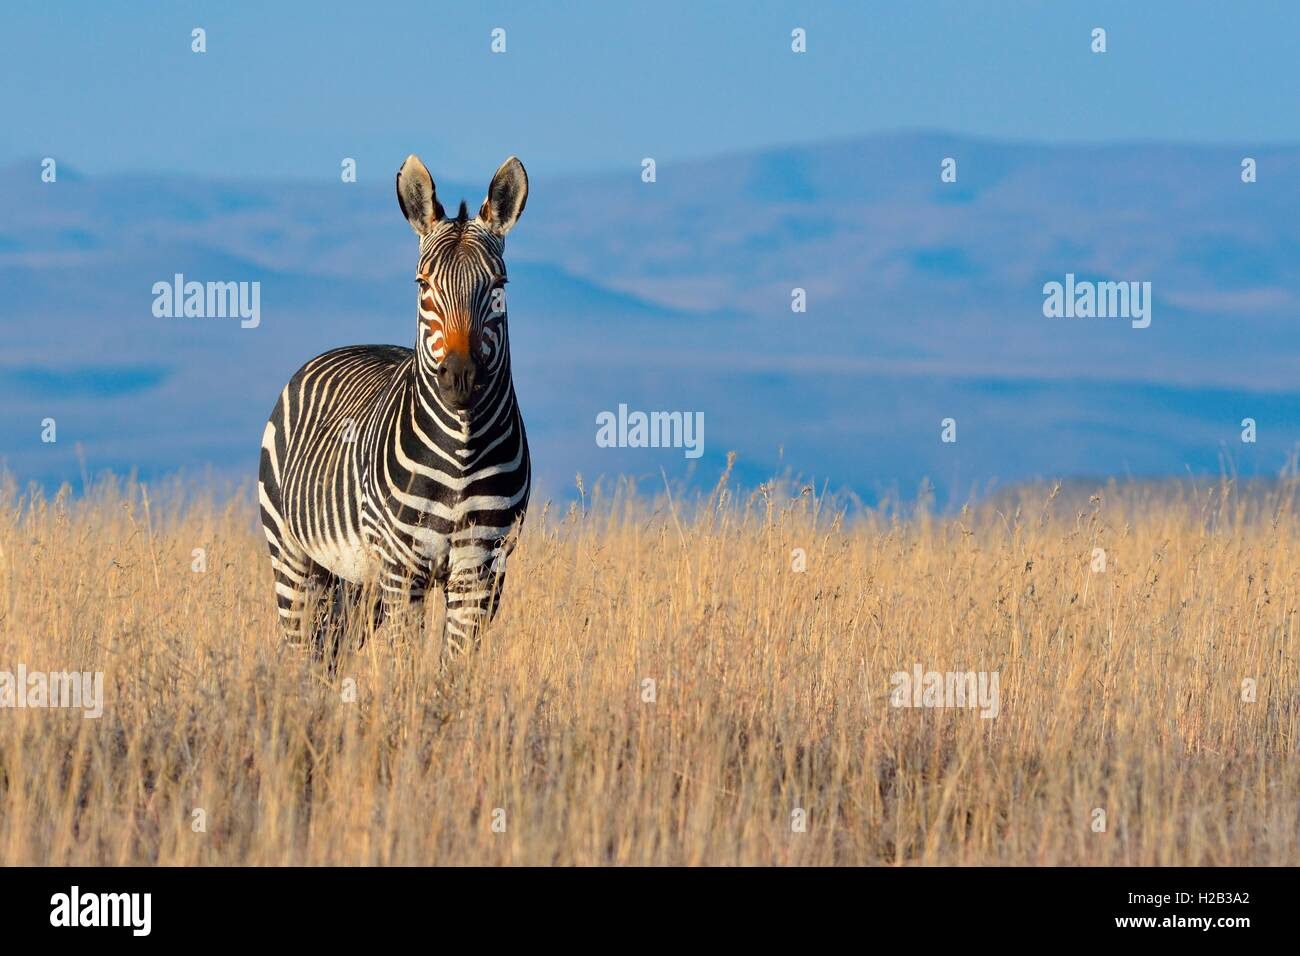 Cape Mountain Zebra (Equus zebra zebra), standing in the dry grass, Mountain Zebra National Park, Eastern Cape, - Stock Image